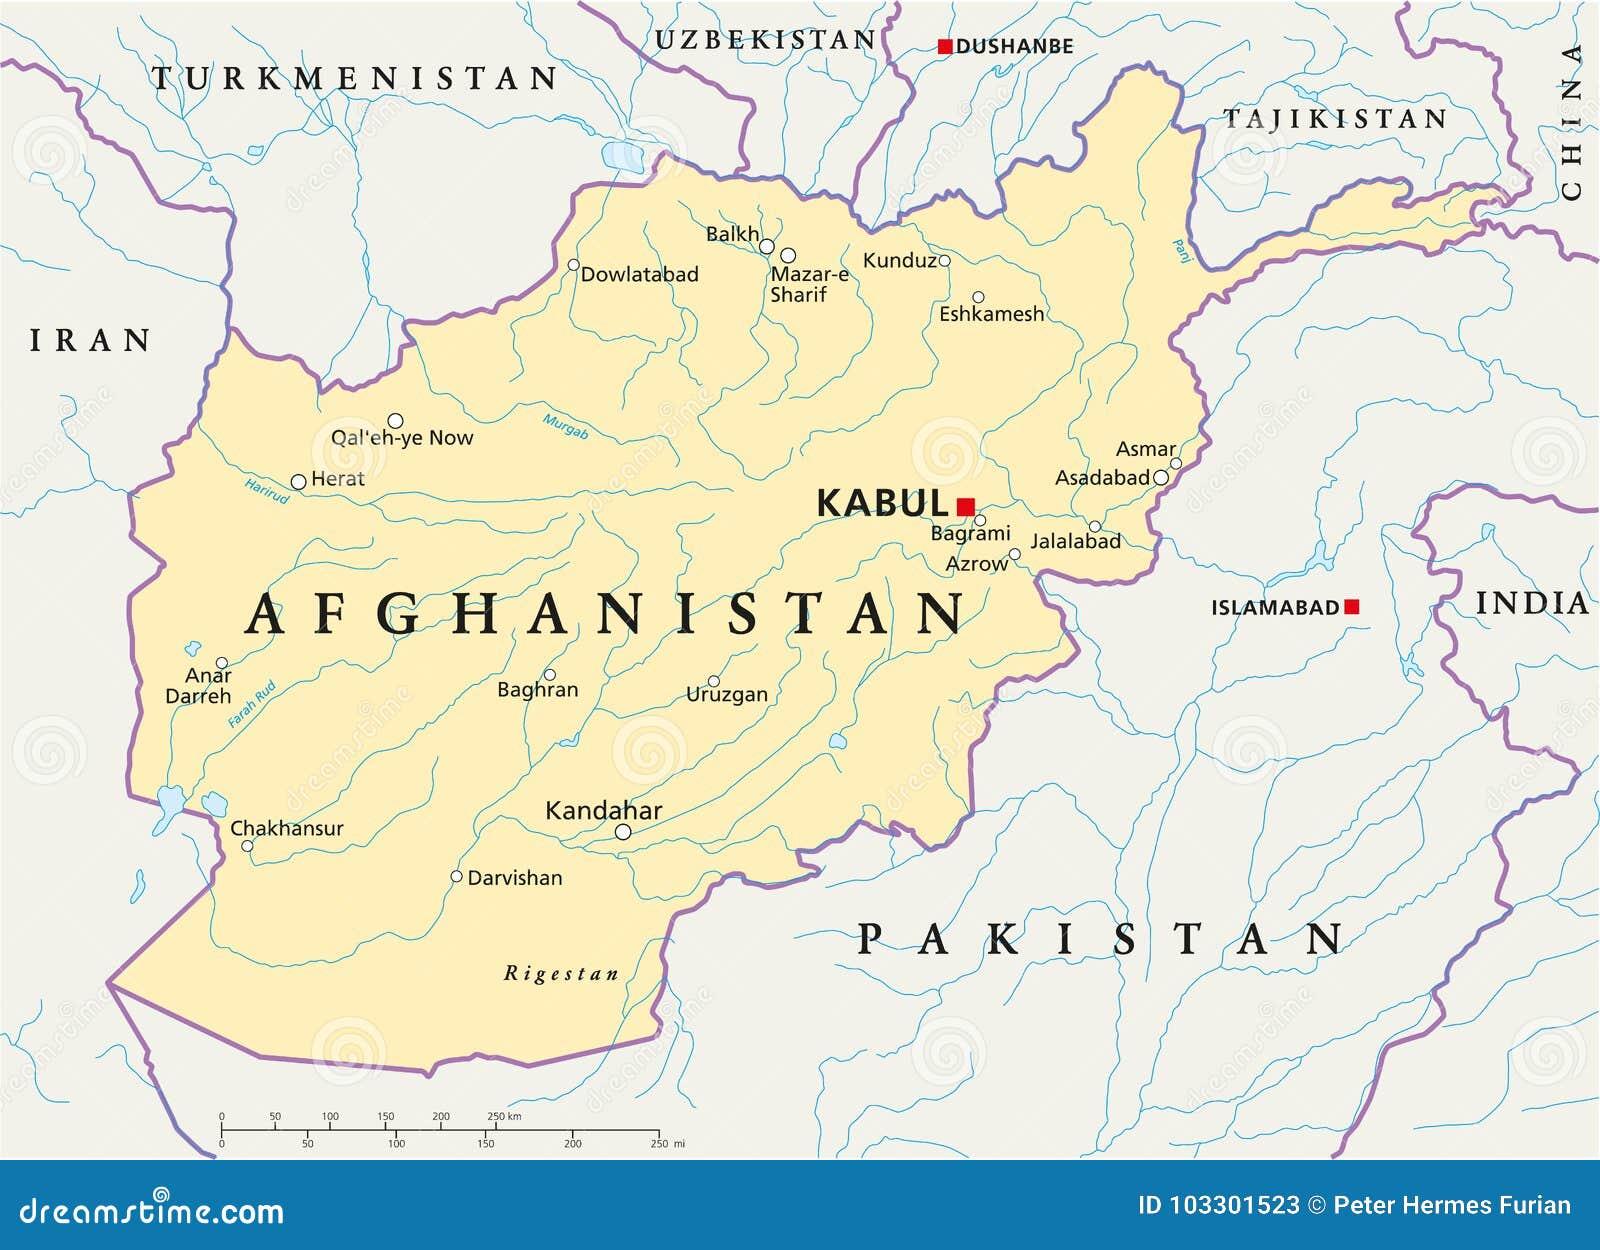 Karte Afghanistan Provinzen.Afghanistan Politische Karte Vektor Abbildung Illustration